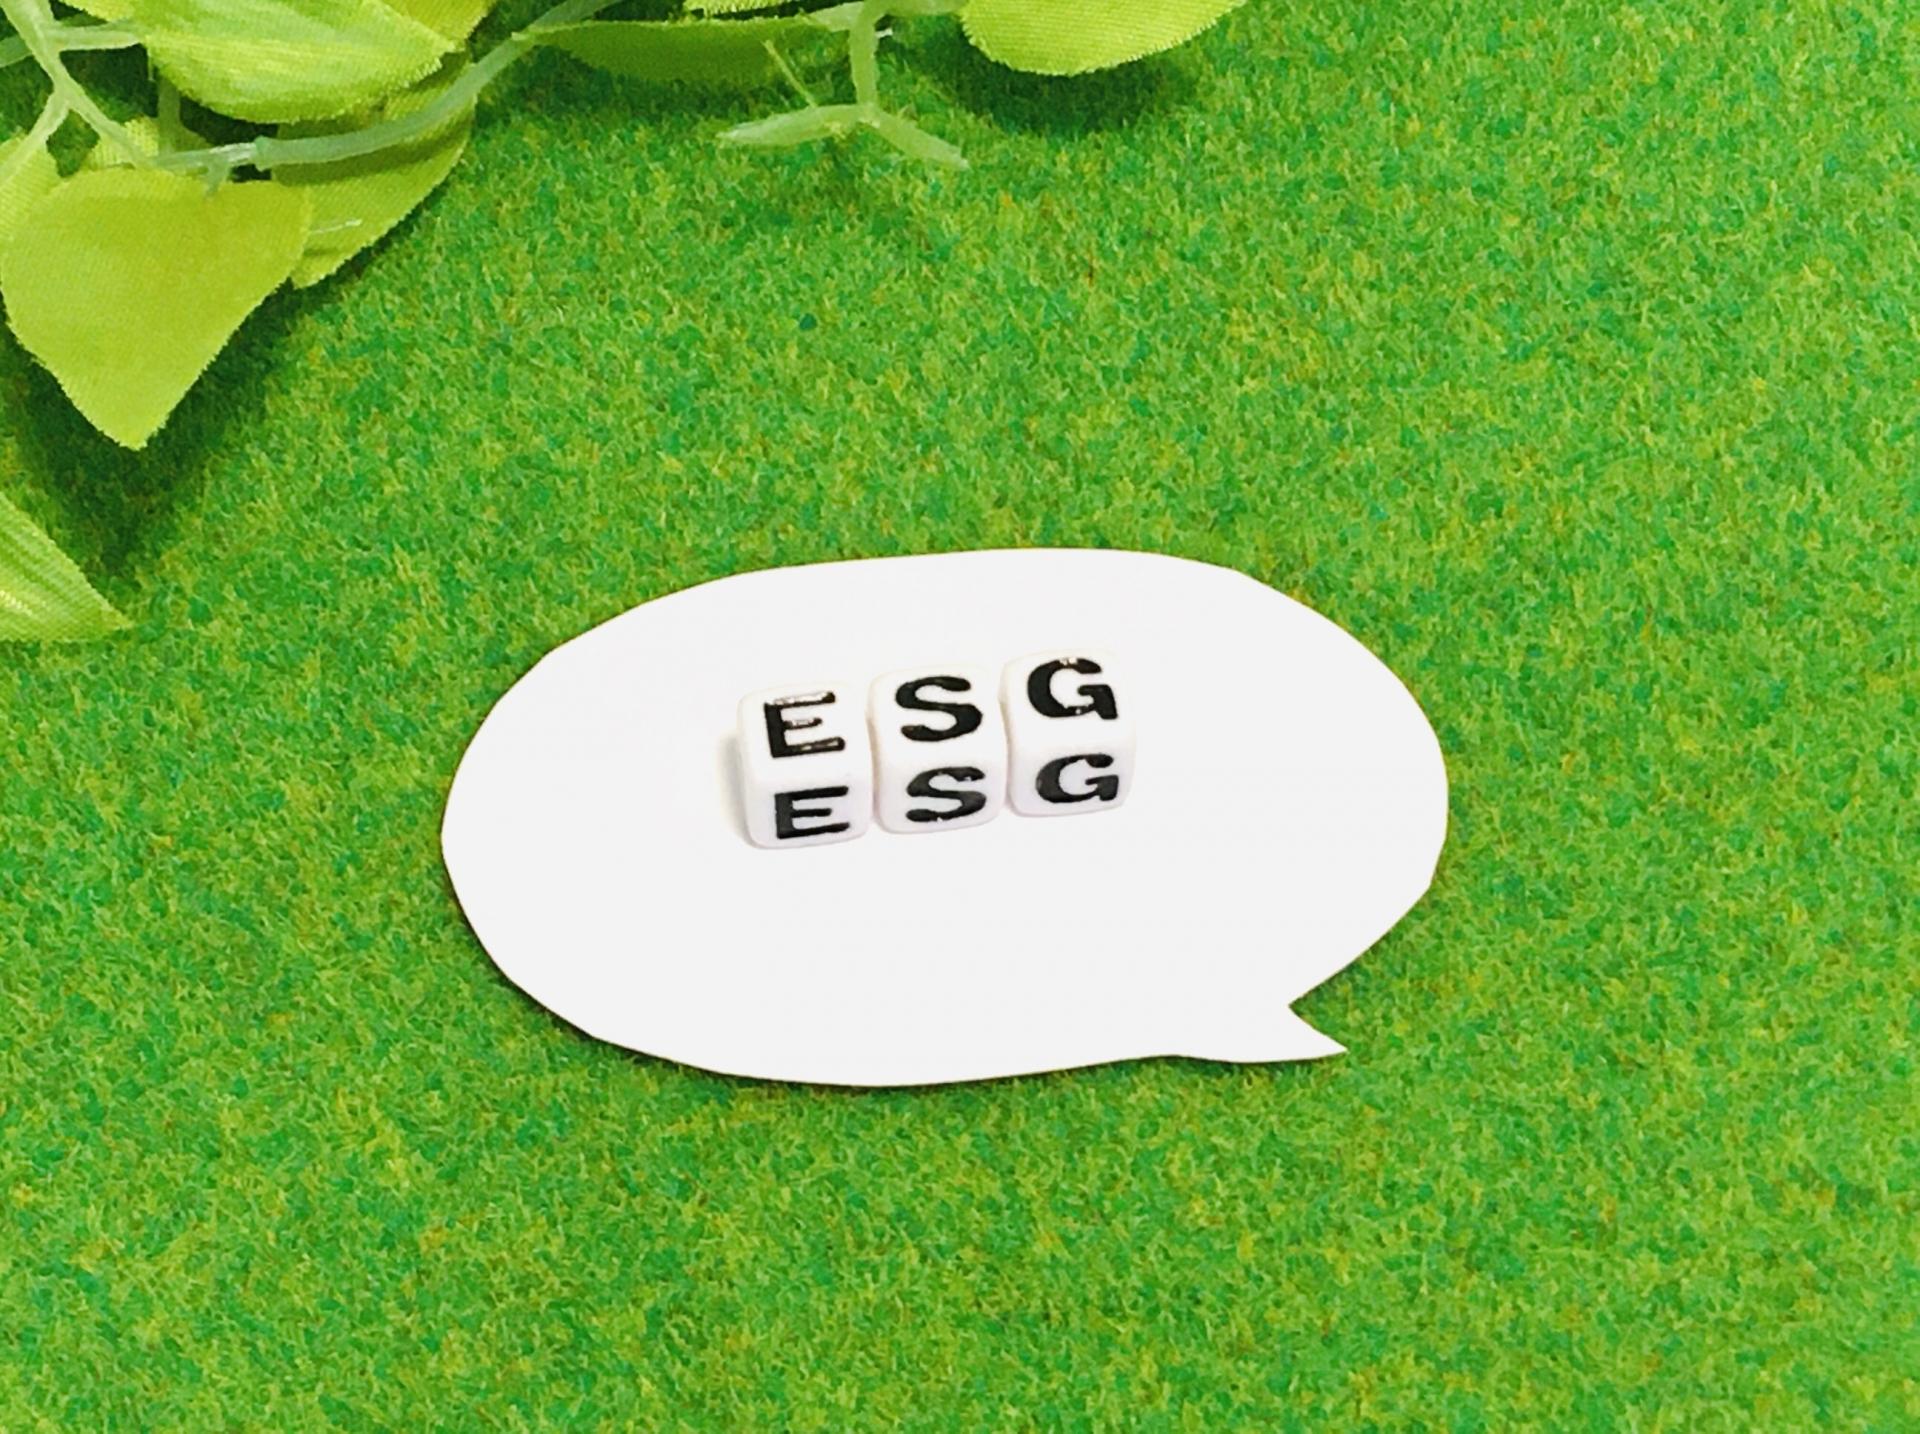 ESG投資とは?市場動向とESG投資の種類について紹介